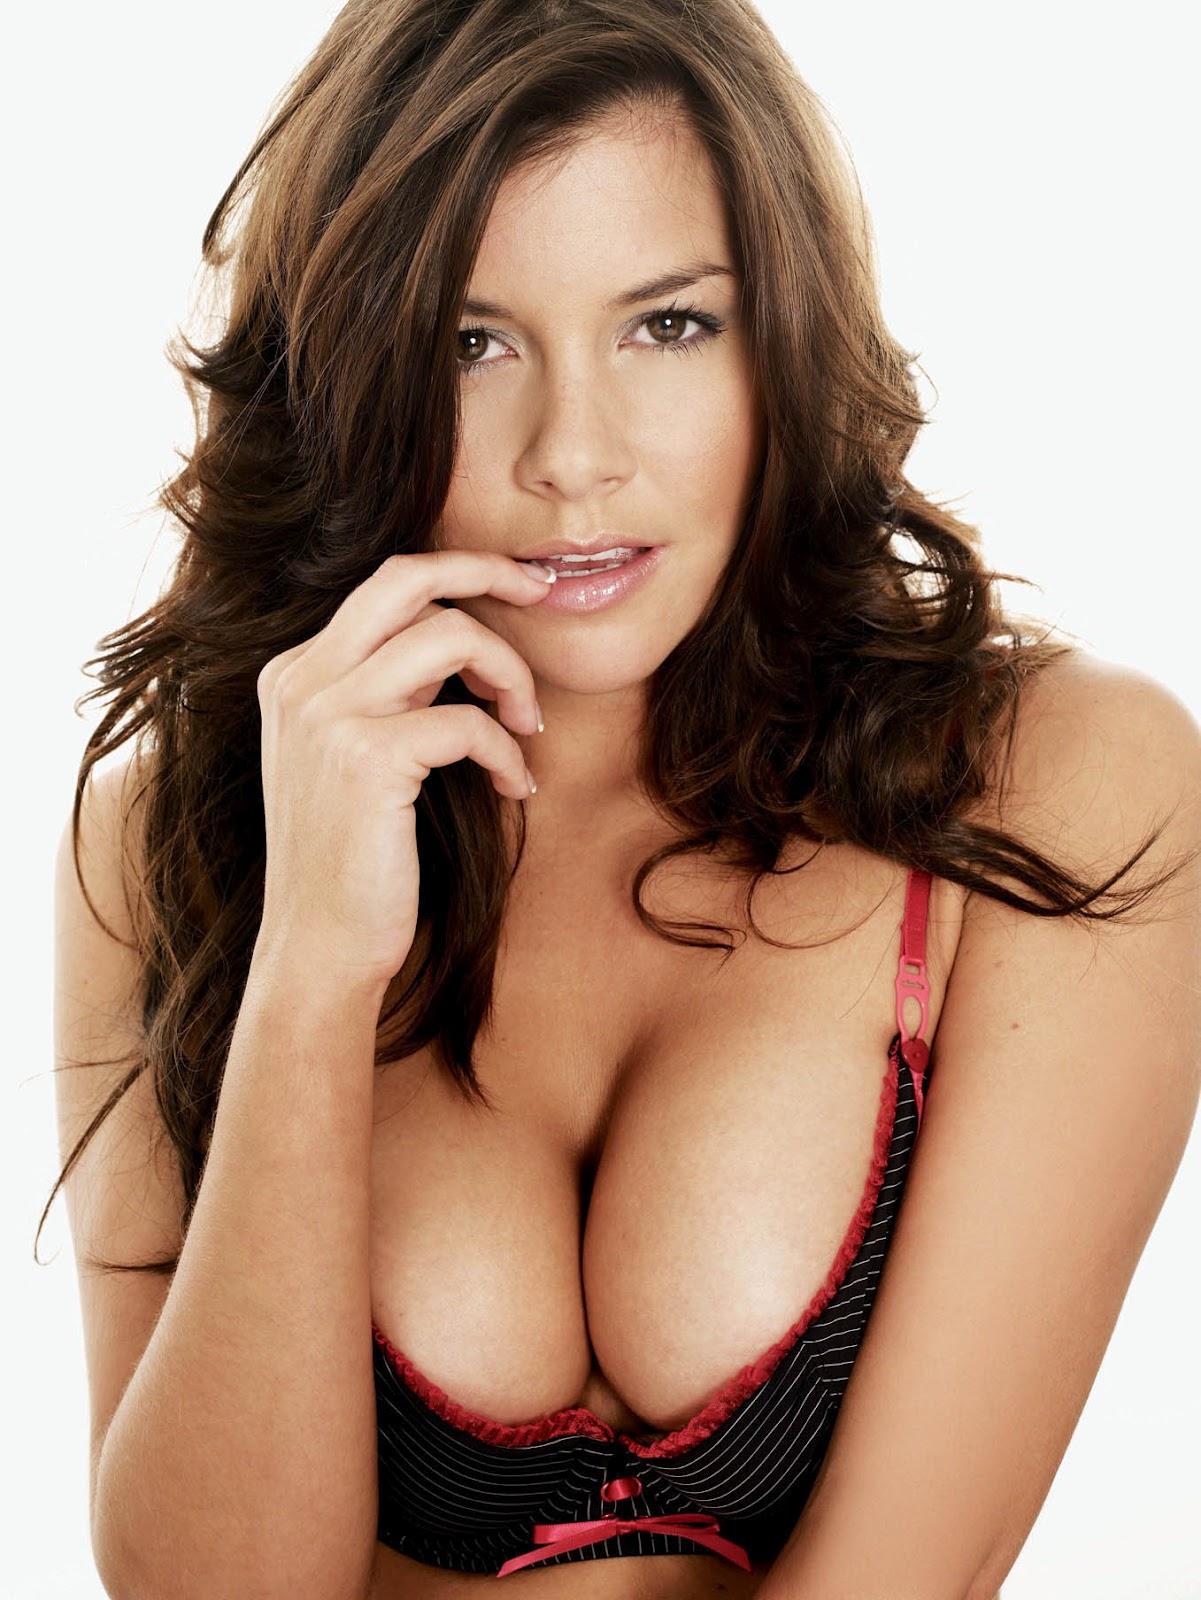 http://2.bp.blogspot.com/-XIs8b5EZKeM/TzhpBwJ2zjI/AAAAAAAAN_Y/V6DP15f3xzc/s1600/imogen_thomas_breasts.jpg